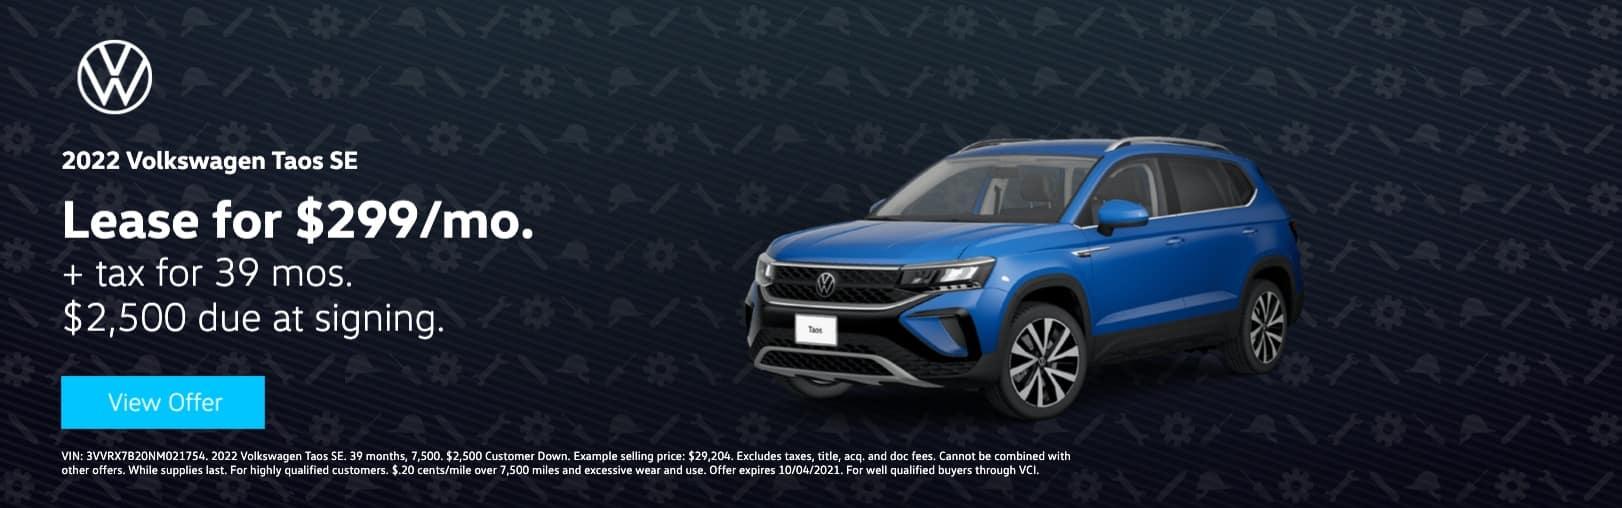 Volkswagen South Coast_test_website_3vvrx7b20nm021754_1622 x 508_2022_volkswagen_taos_se__0